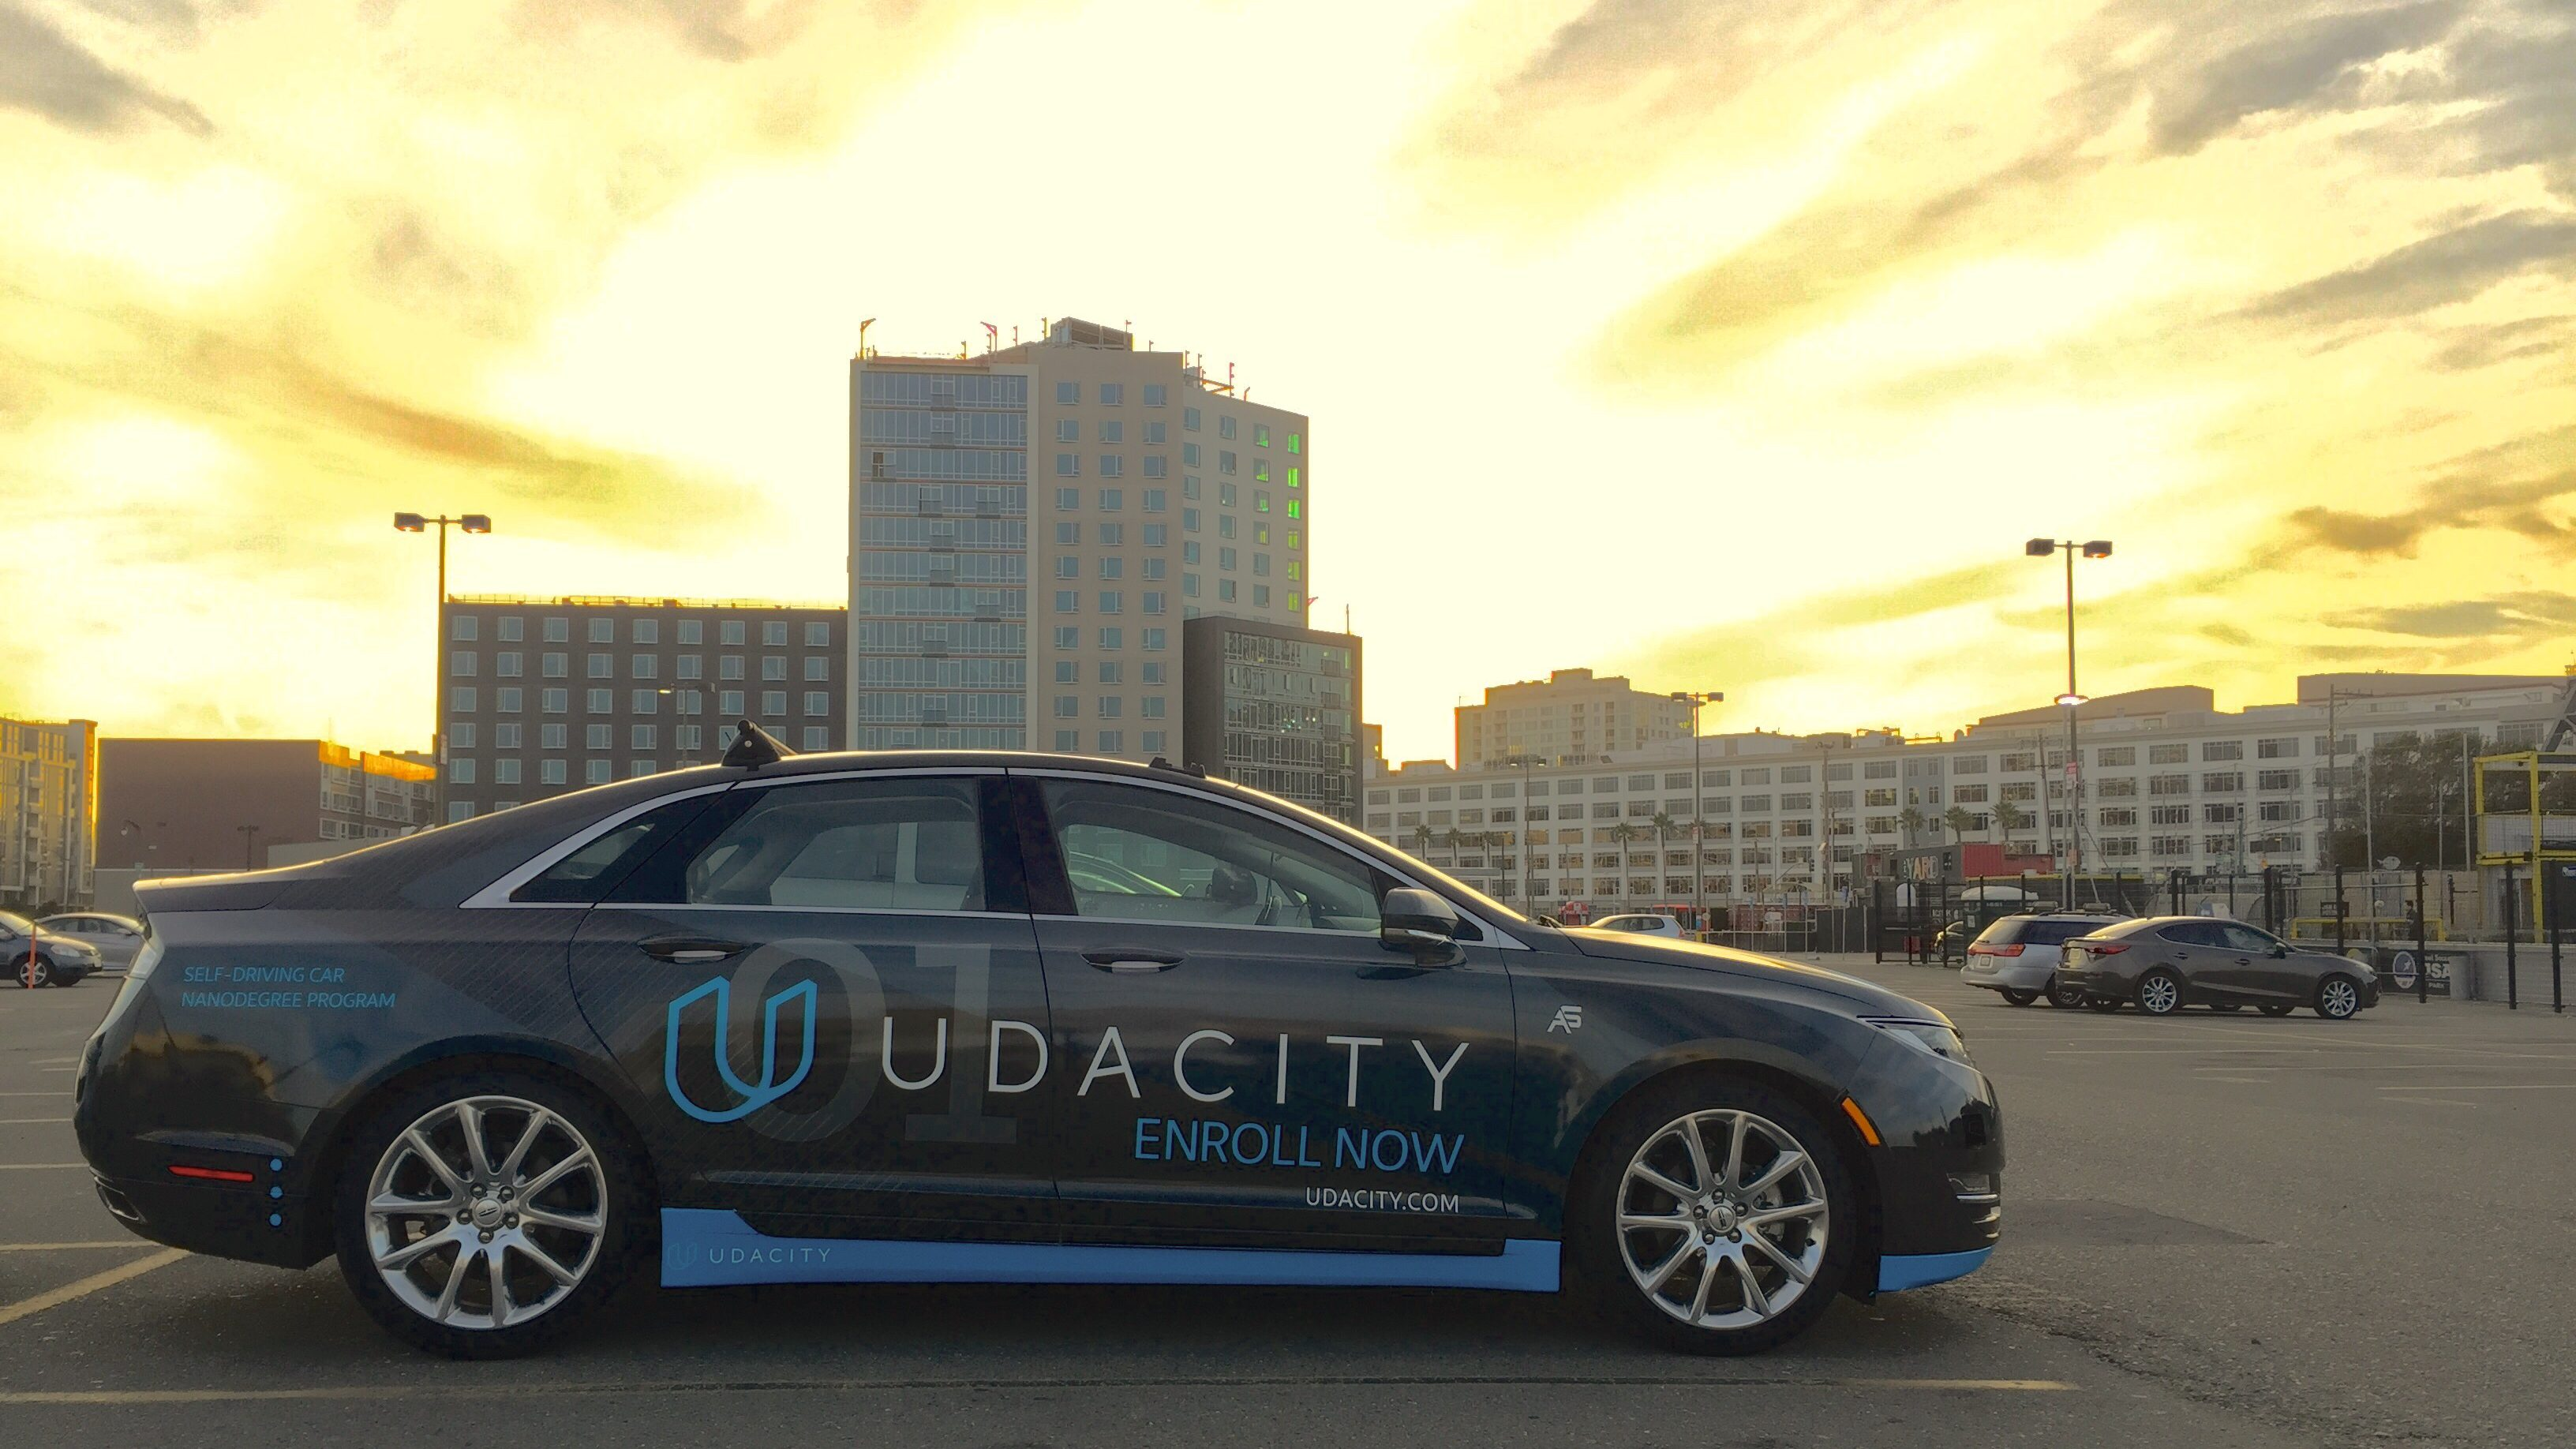 A self-driving Udacity car.